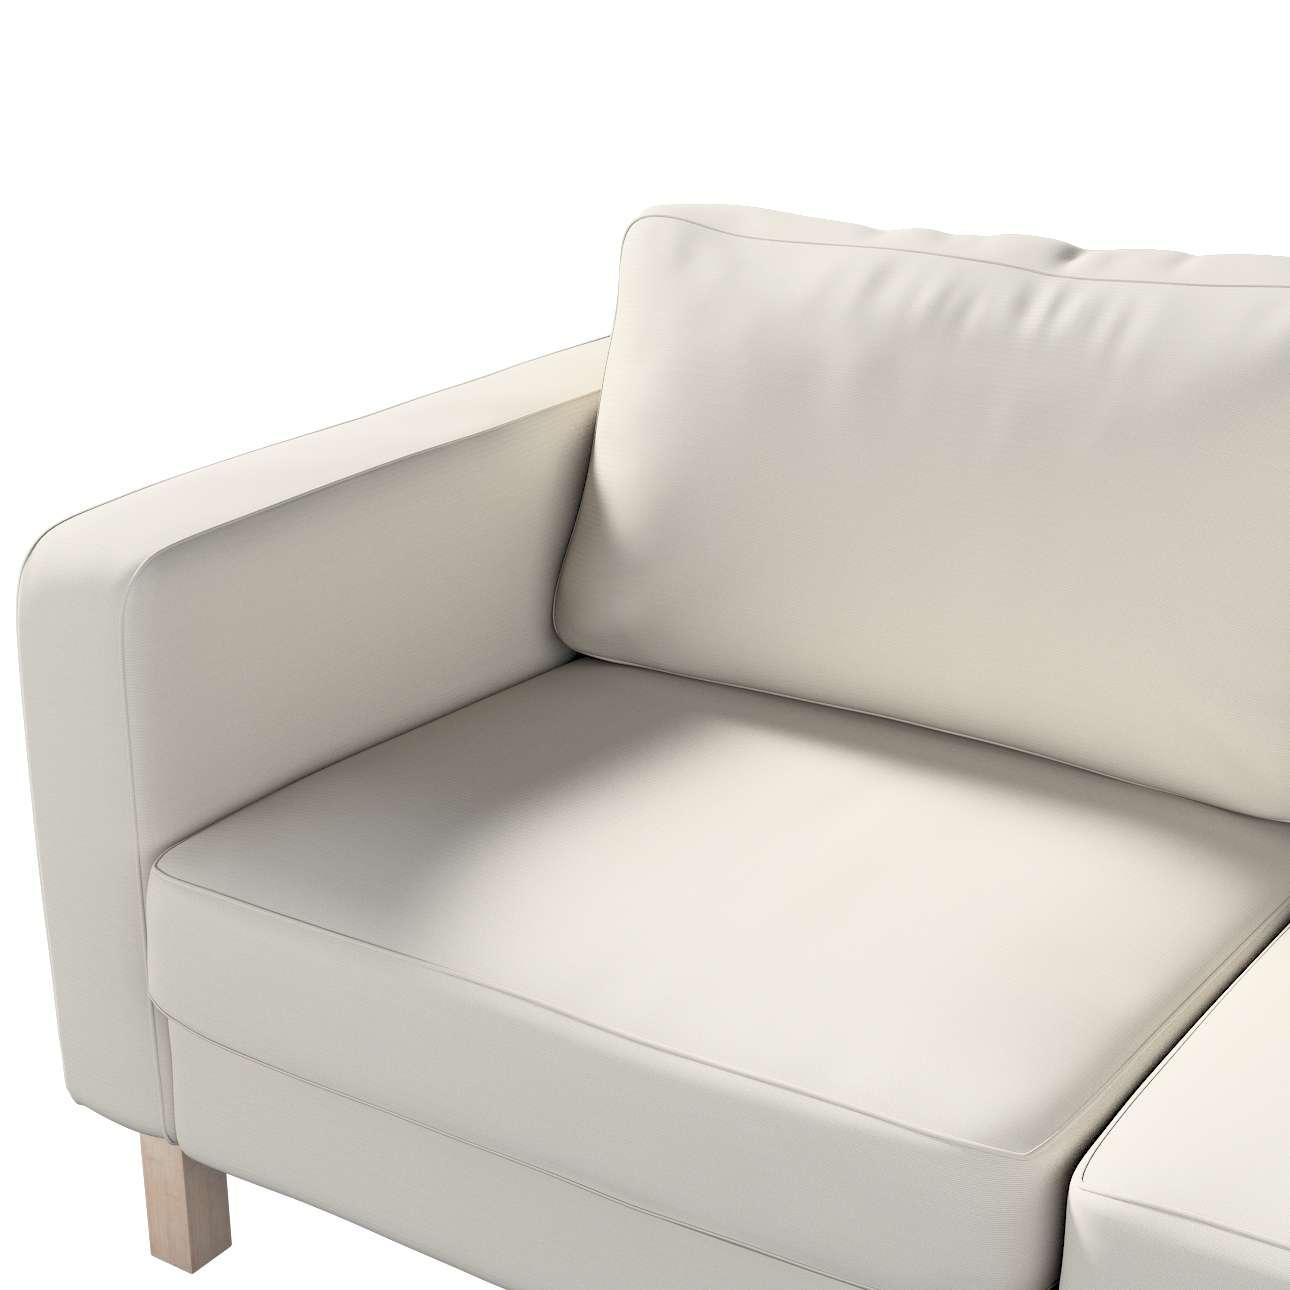 Karlstad klädsel 2-sits soffa - kort i kollektionen Panama Cotton, Tyg: 702-31